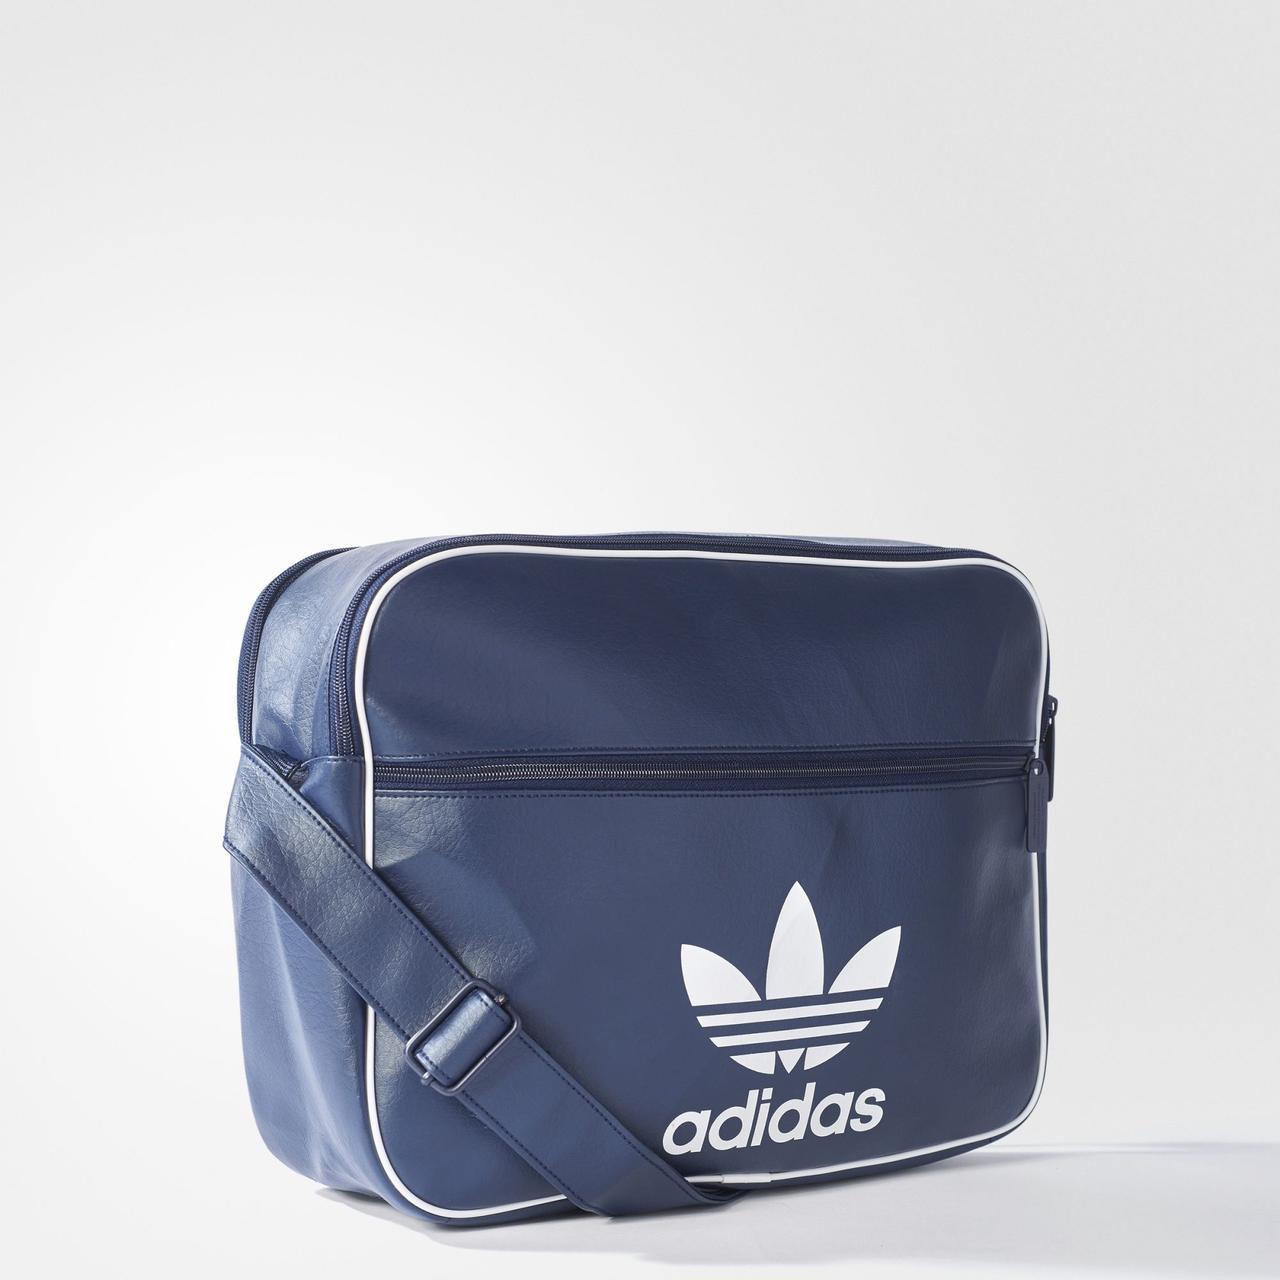 2265e81fd932 Сумка Adidas Originals Airliner Classic (Артикул: BK2116), цена 1 390 грн.,  купить в Киеве — Prom.ua (ID#520162870)